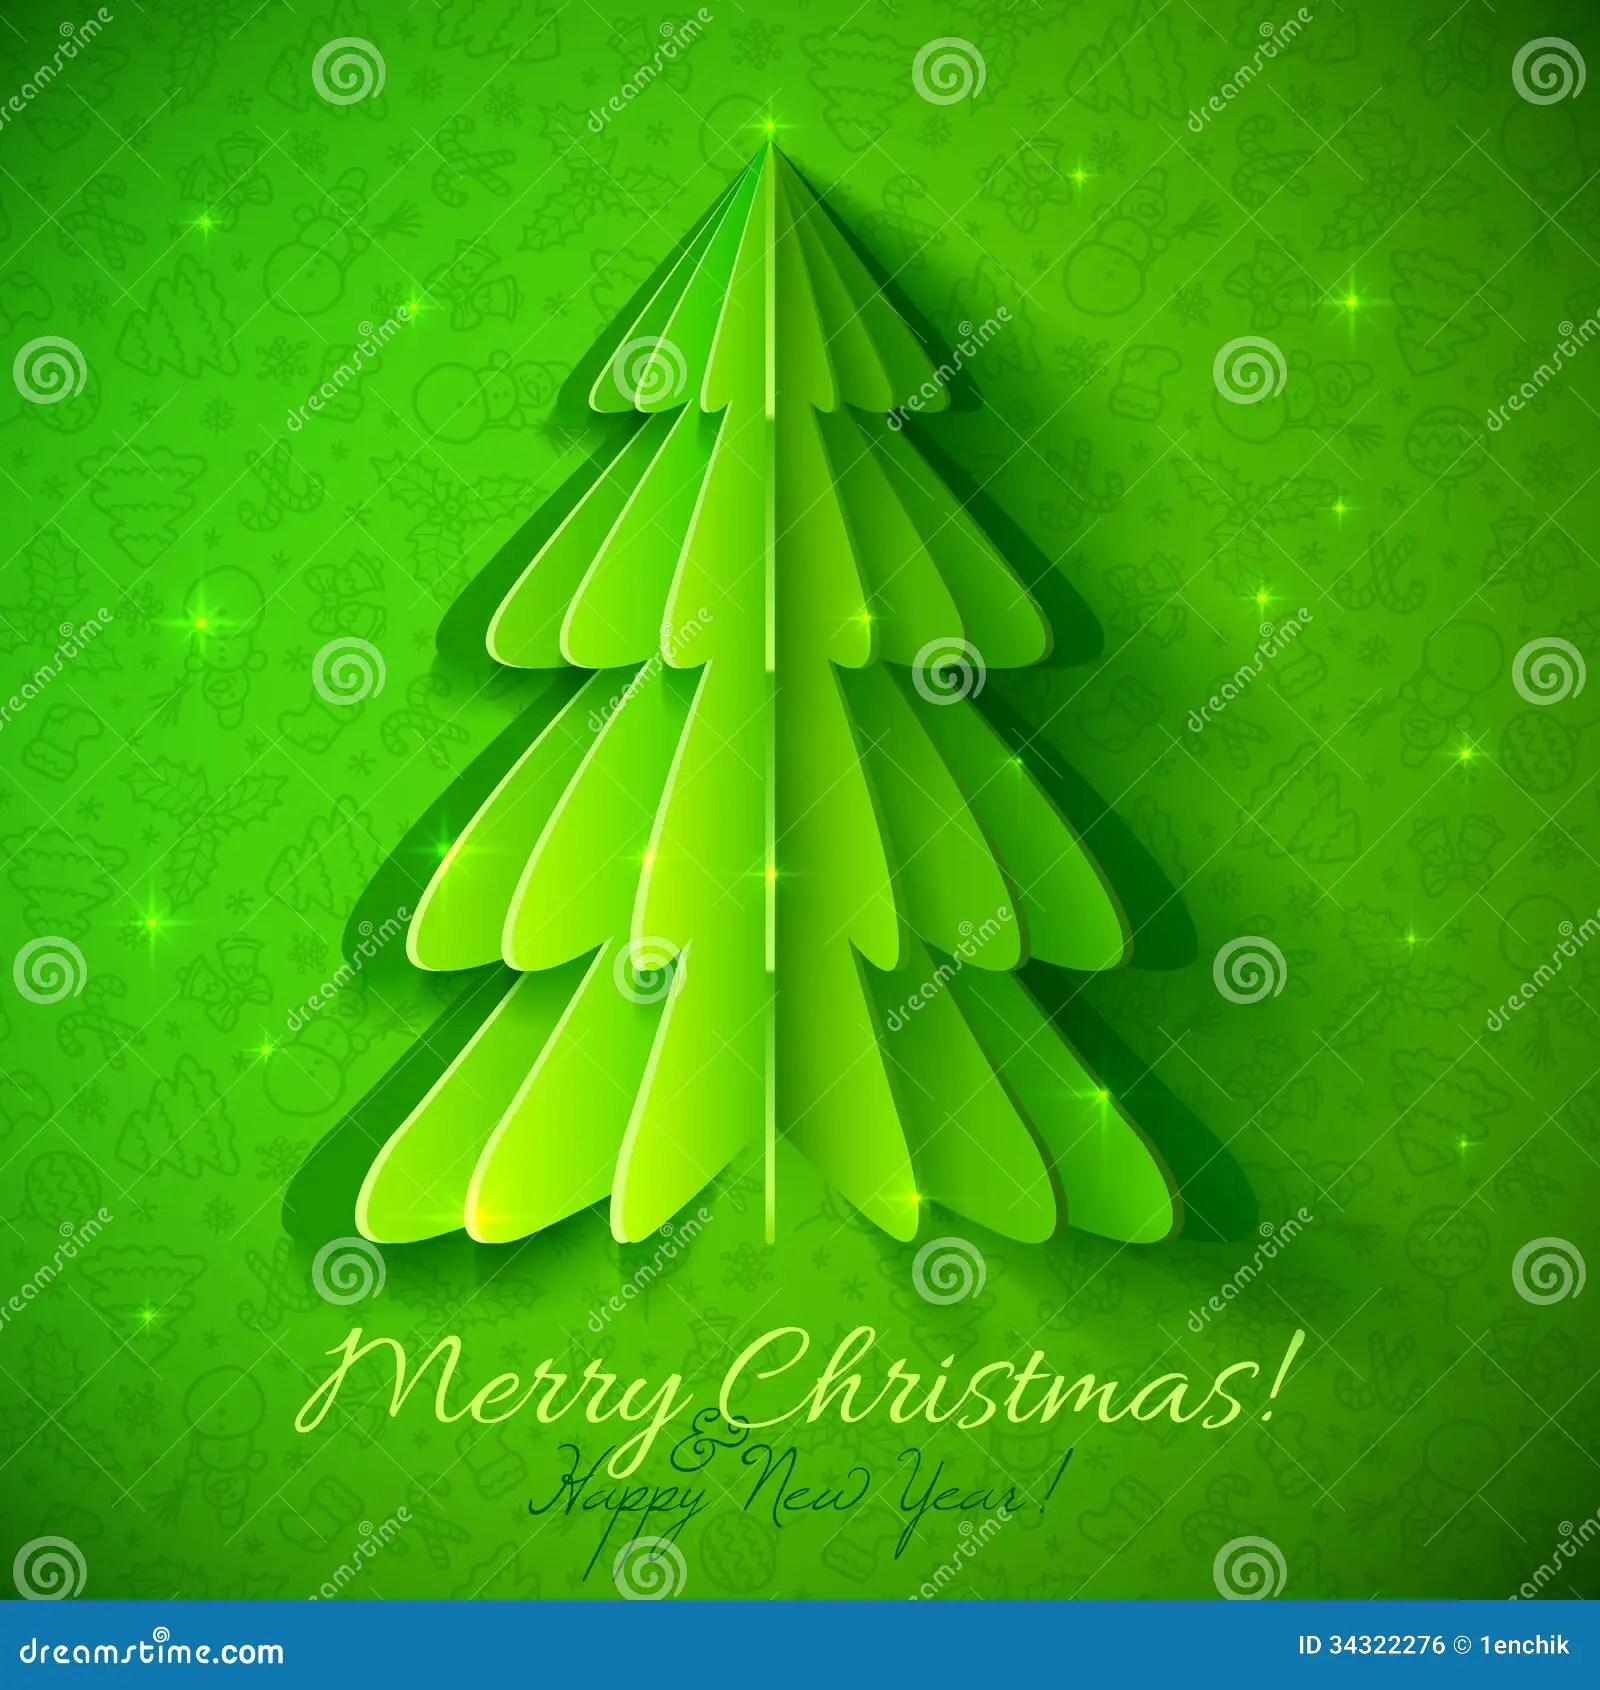 Green Origami Christmas Tree Greeting Card Stock Vector